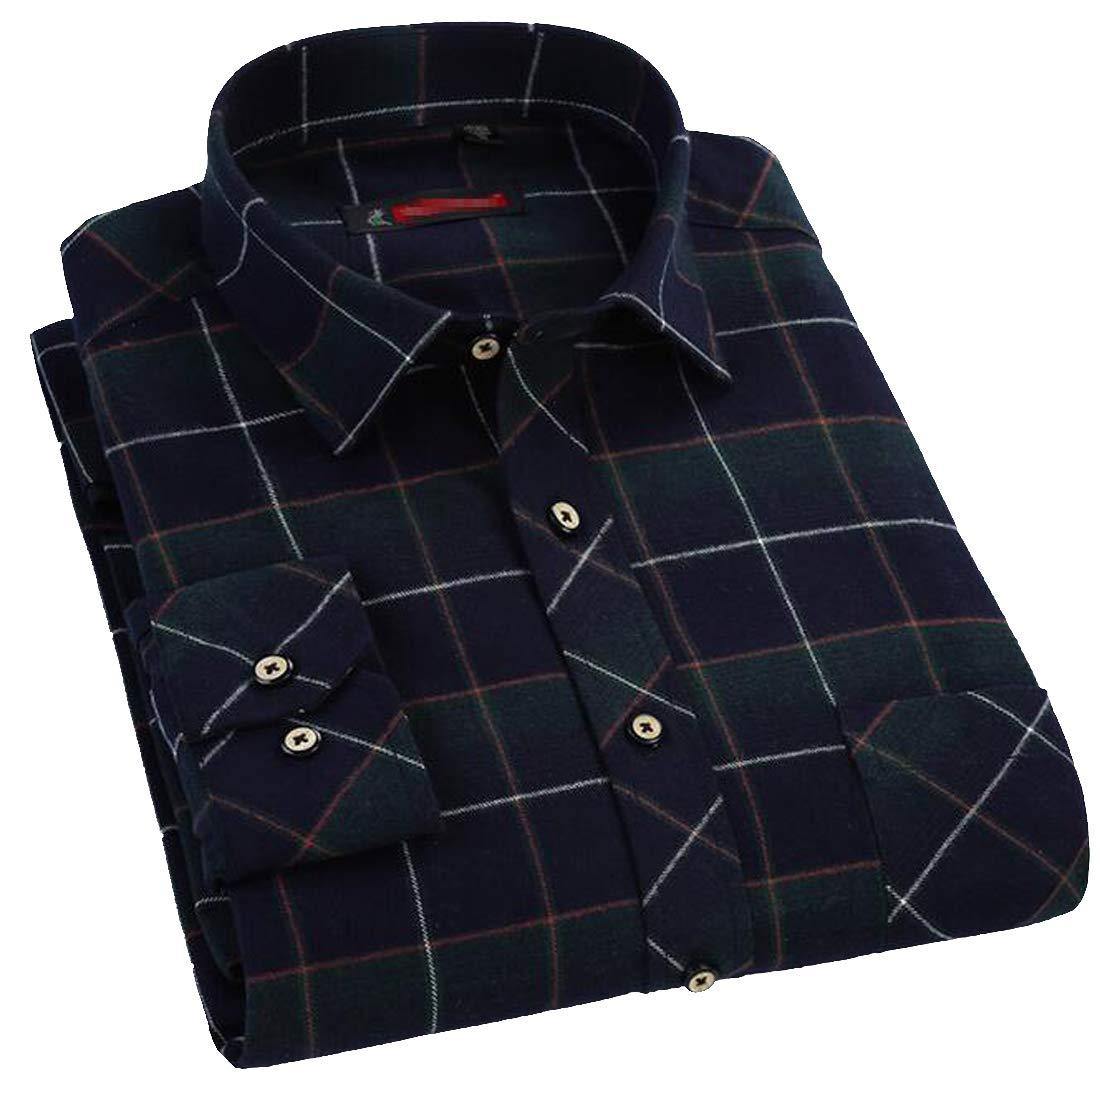 Pivaconis Mens Vintage Plaid Flannel Button Down Long Sleeve Casual Slim Buffalo Shirts